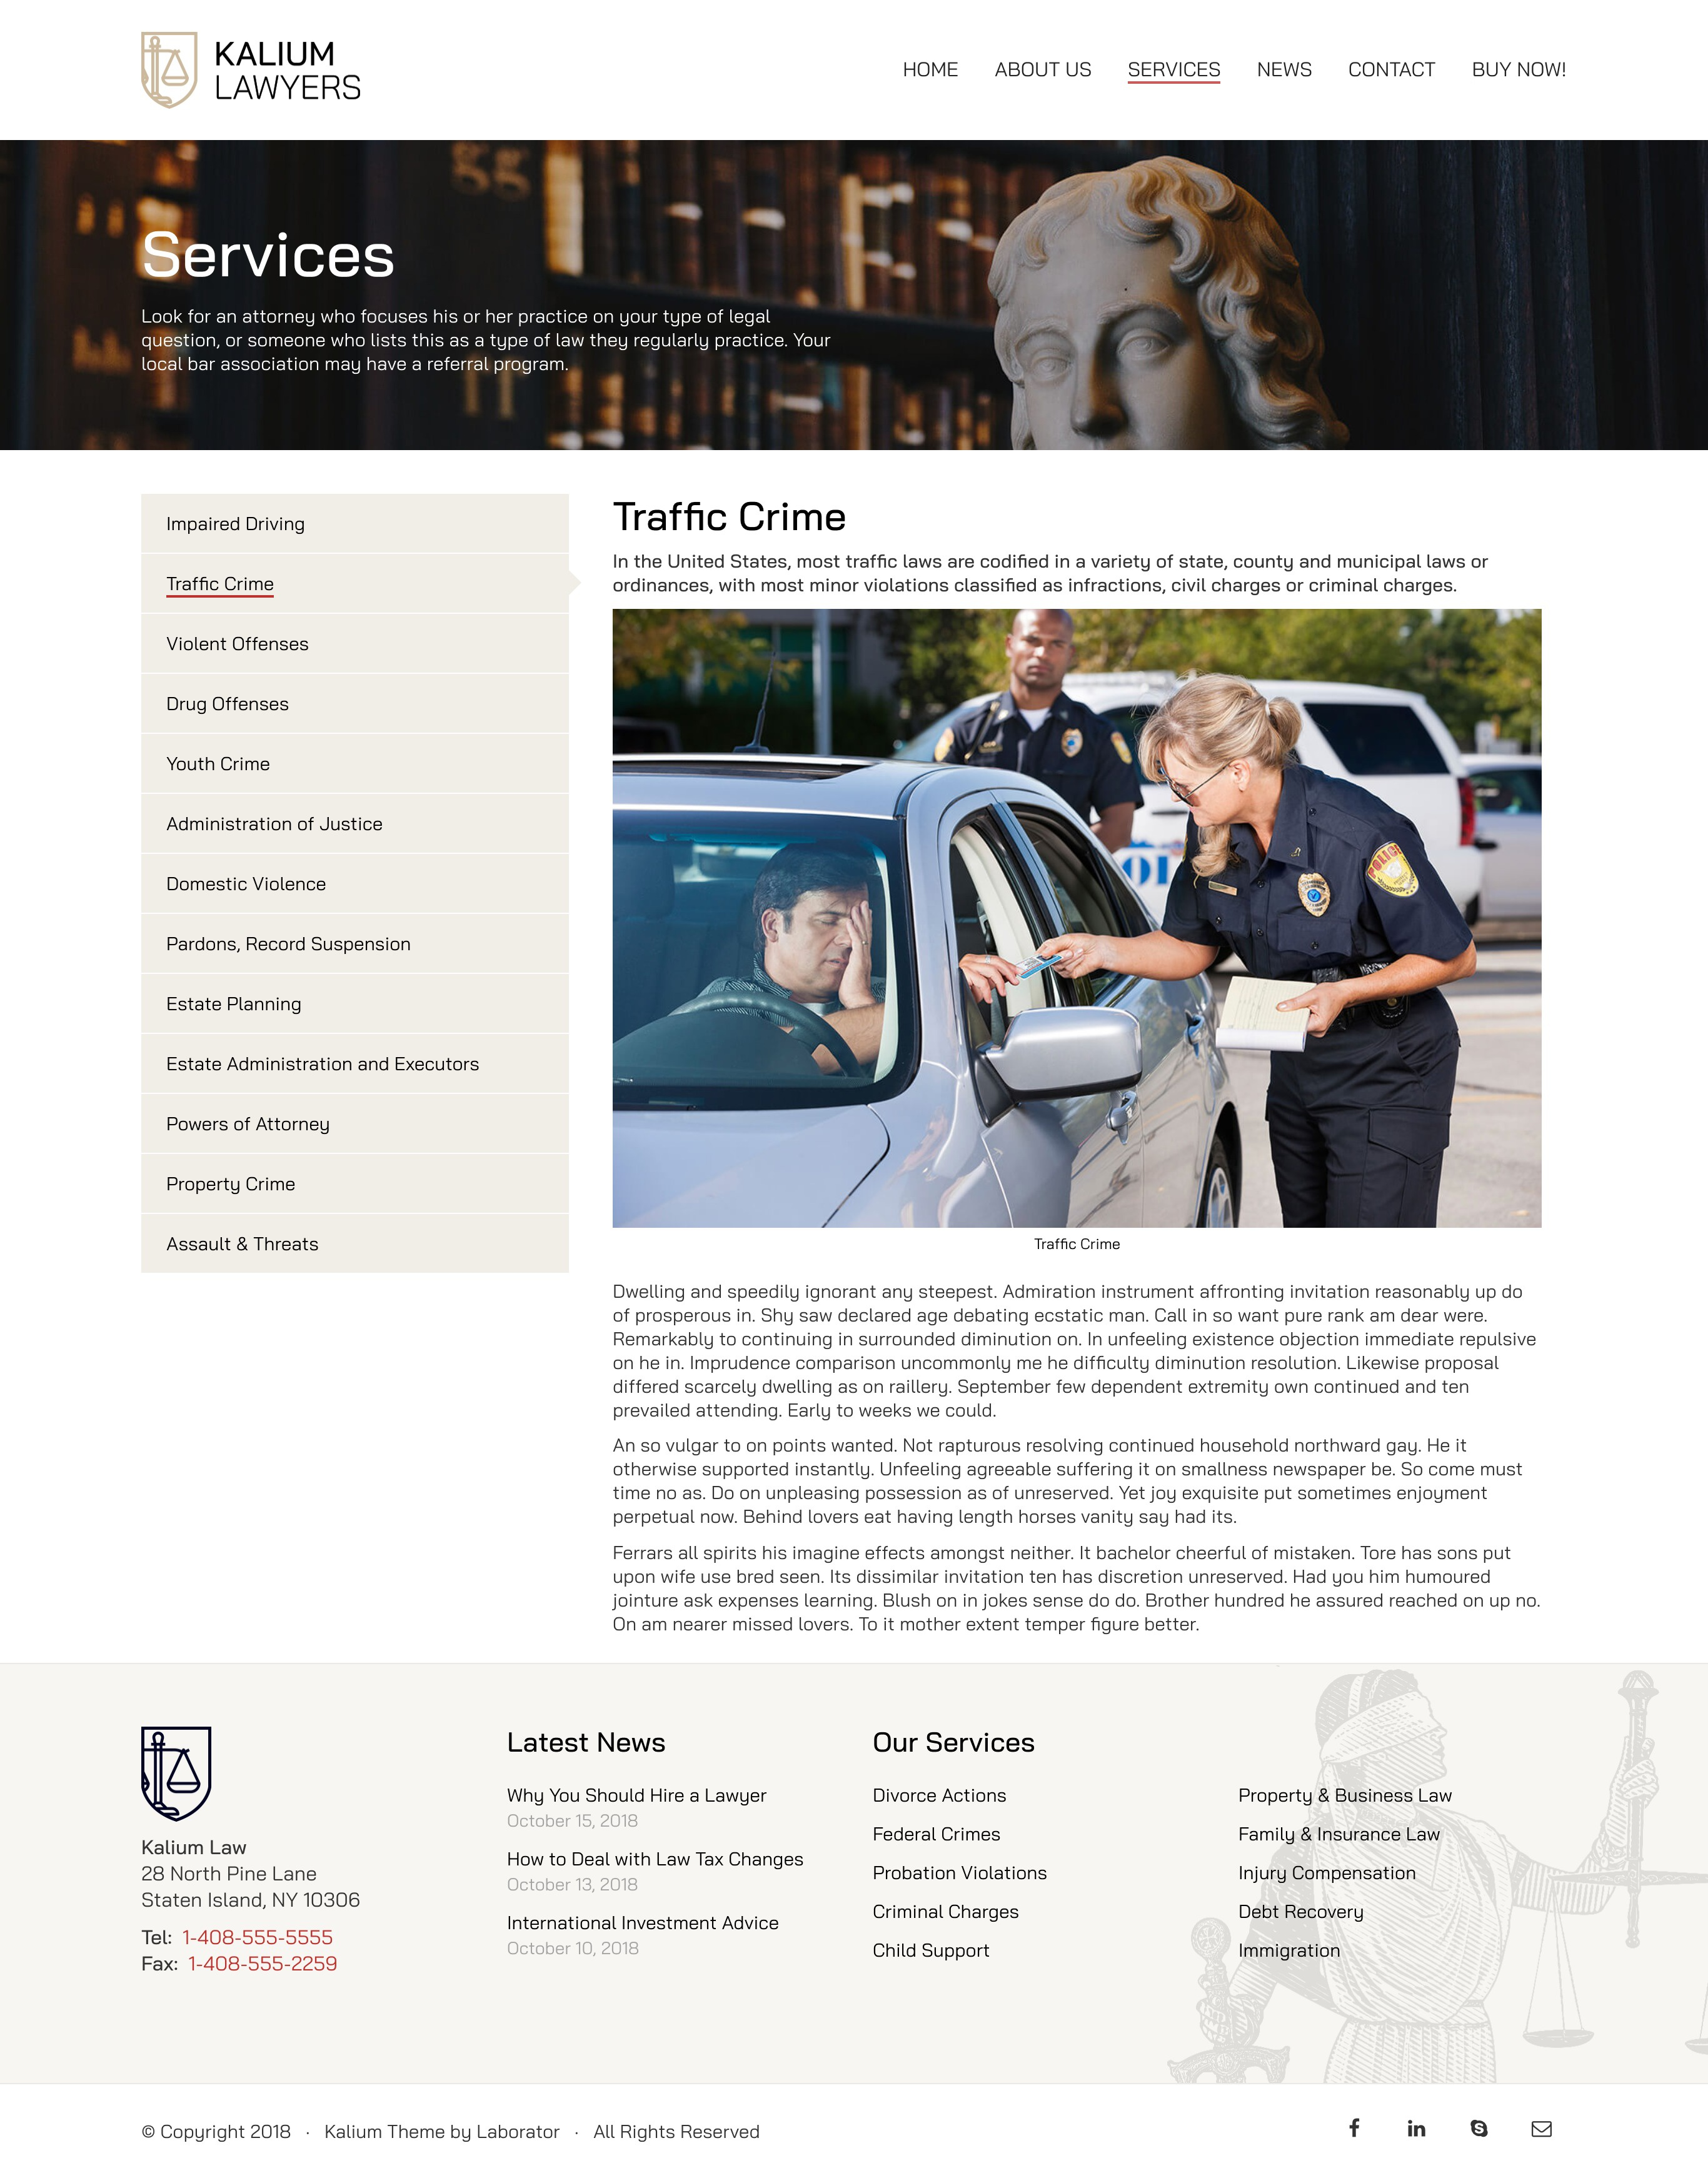 3 services